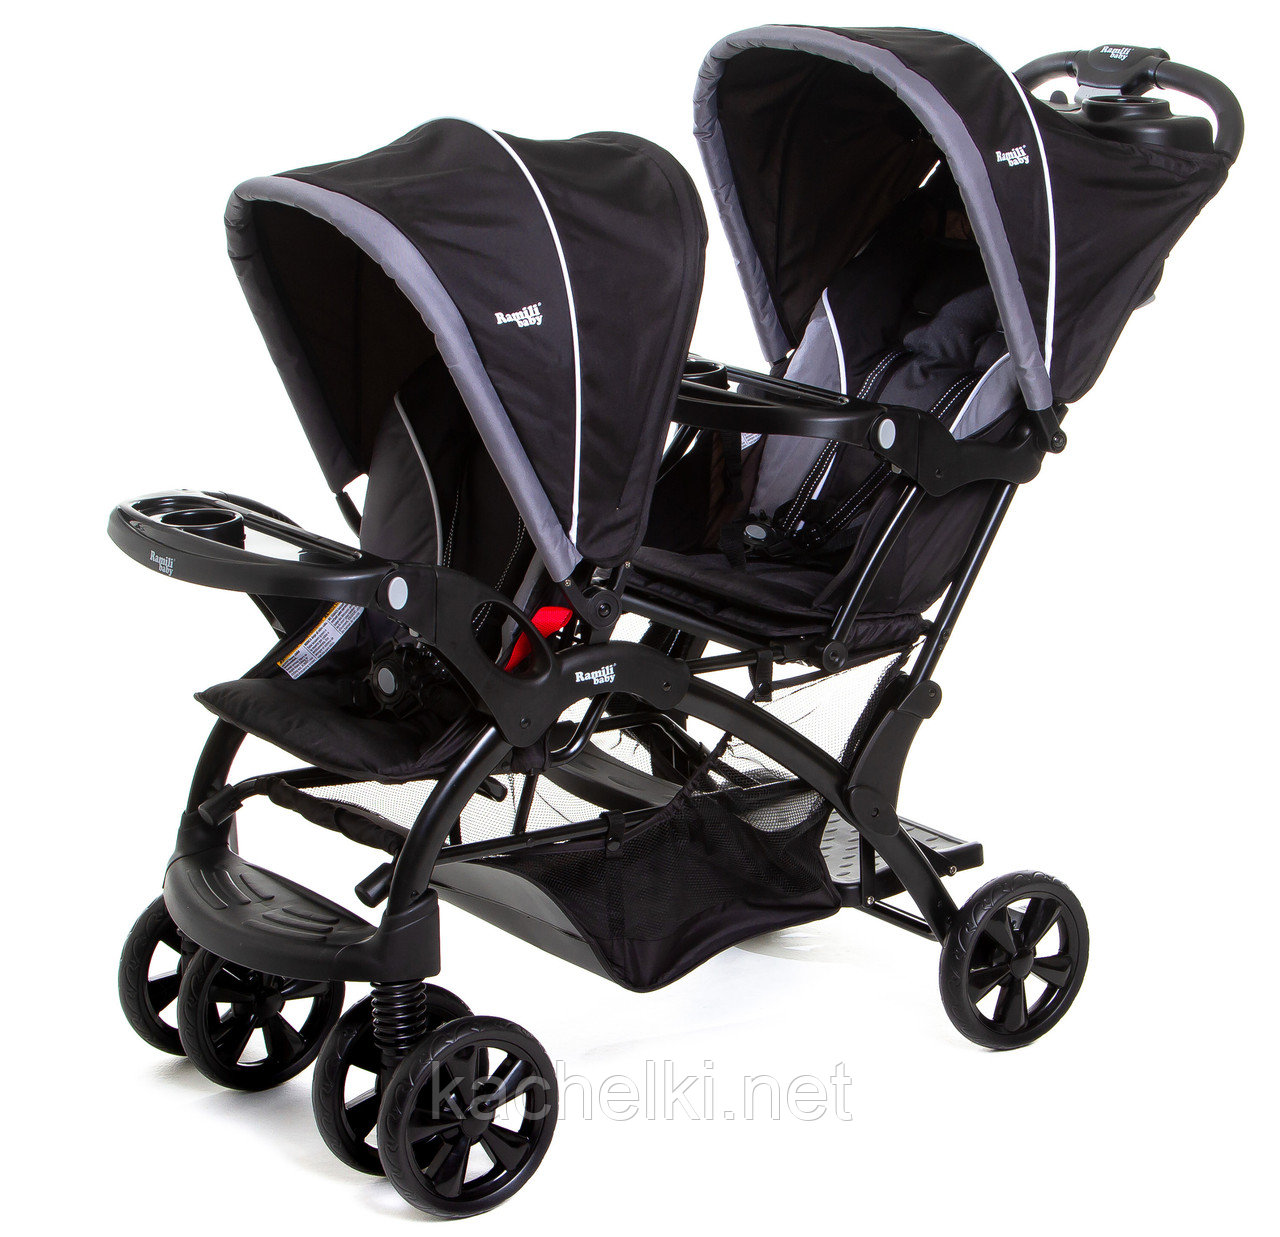 Детская коляска для двойни Ramili Baby Twin ST